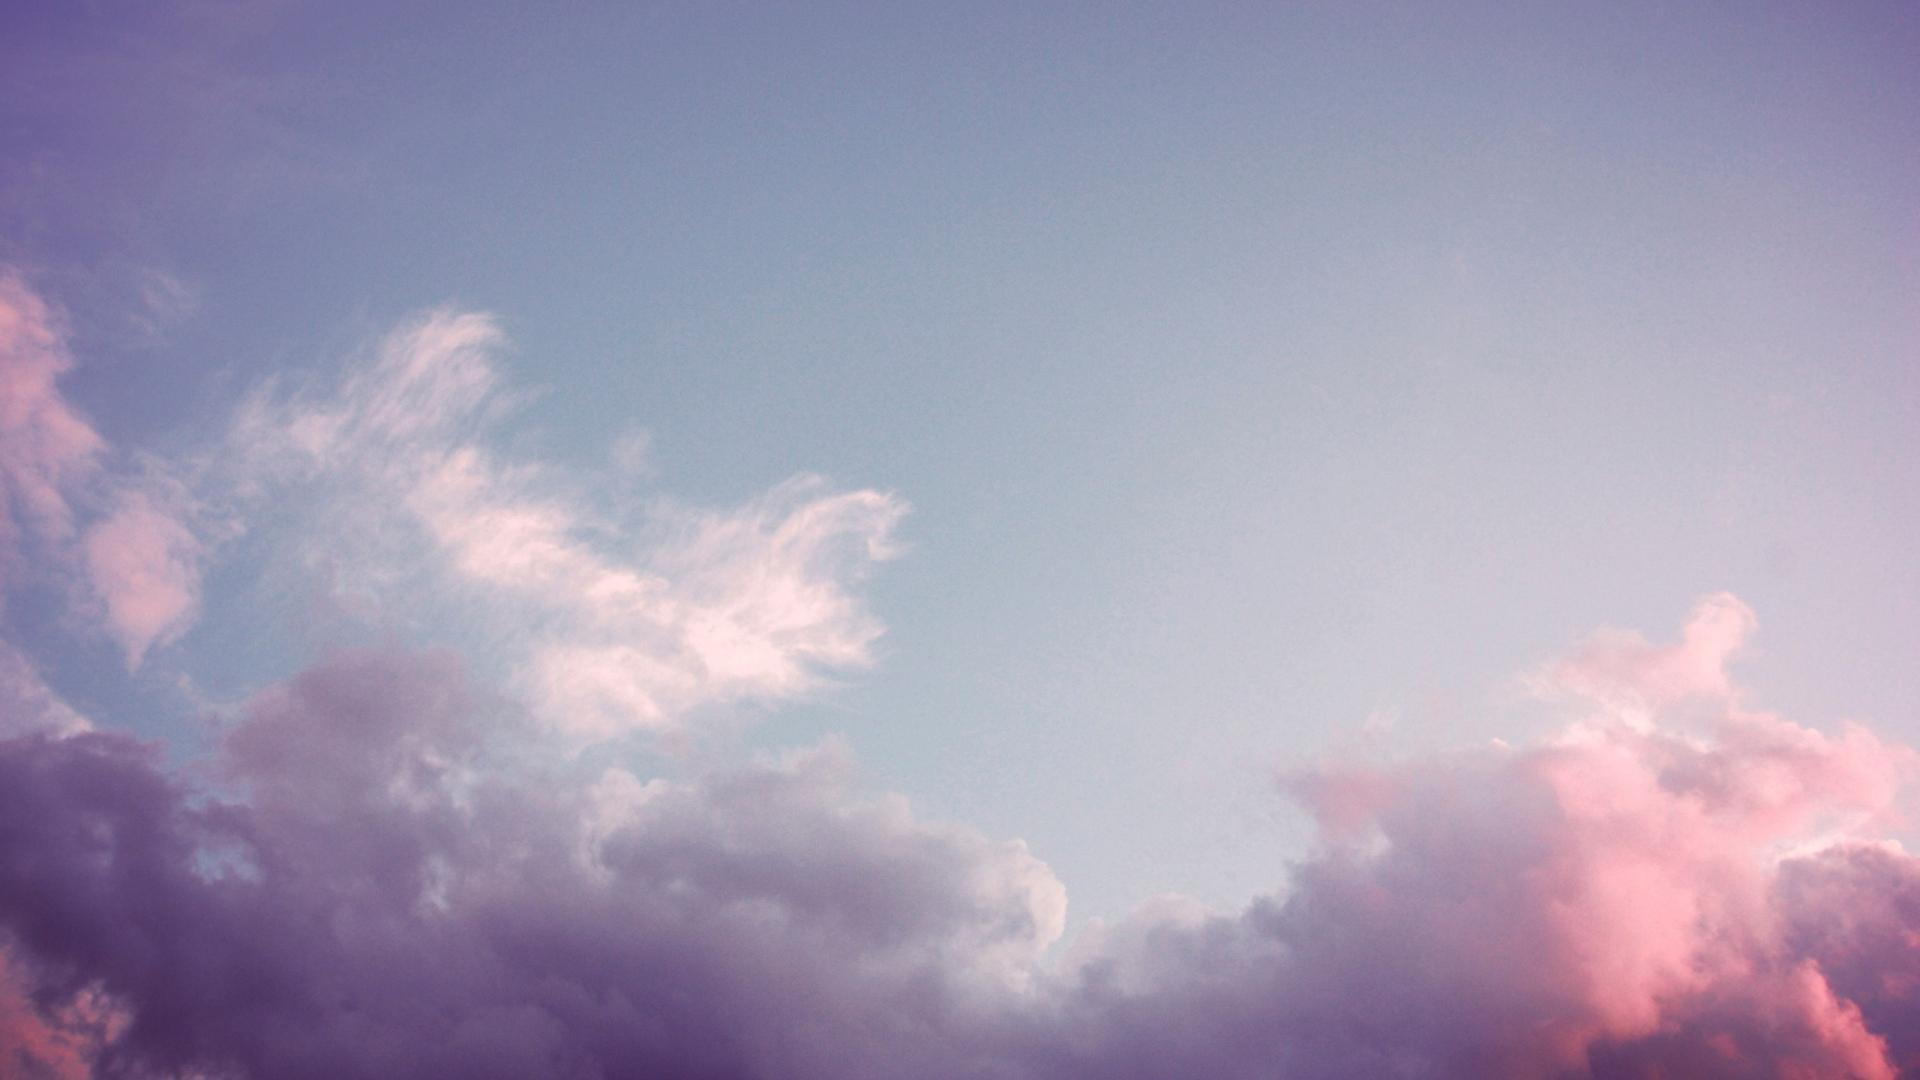 12+] Clouds and Sky Wallpaper on WallpaperSafari